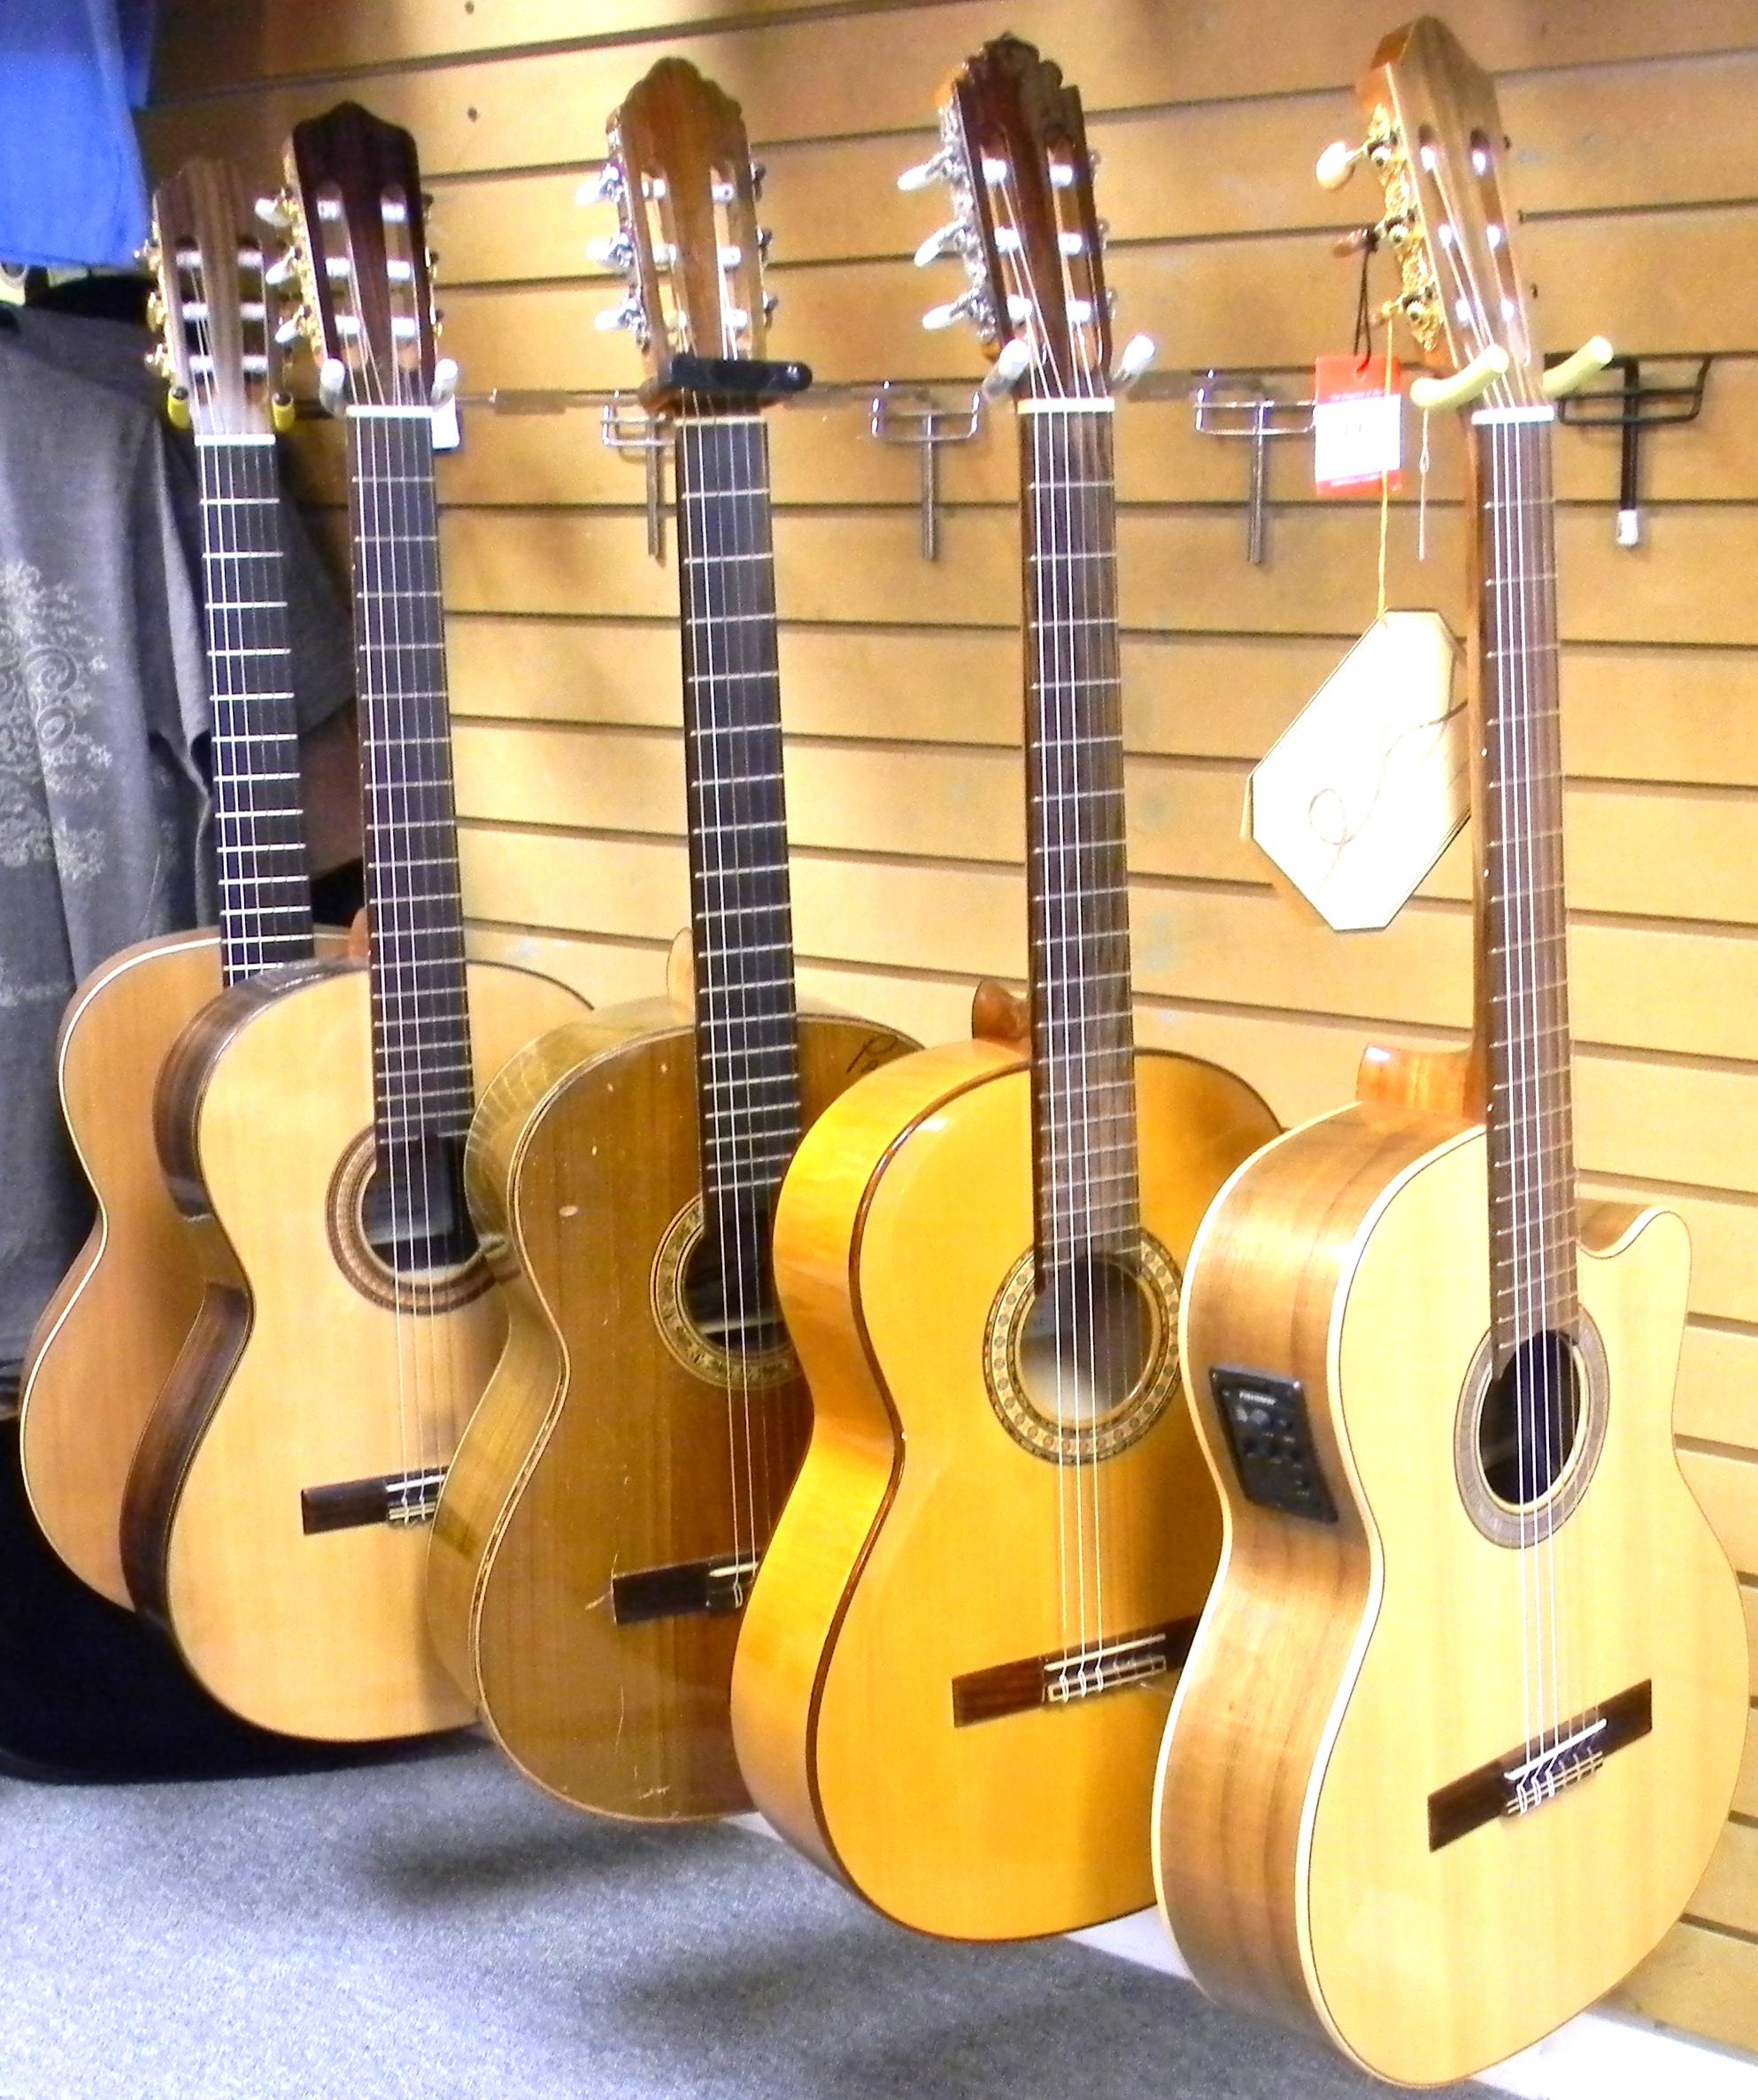 kremona feb 2013 041 san antonio guitar store guitar tex. Black Bedroom Furniture Sets. Home Design Ideas